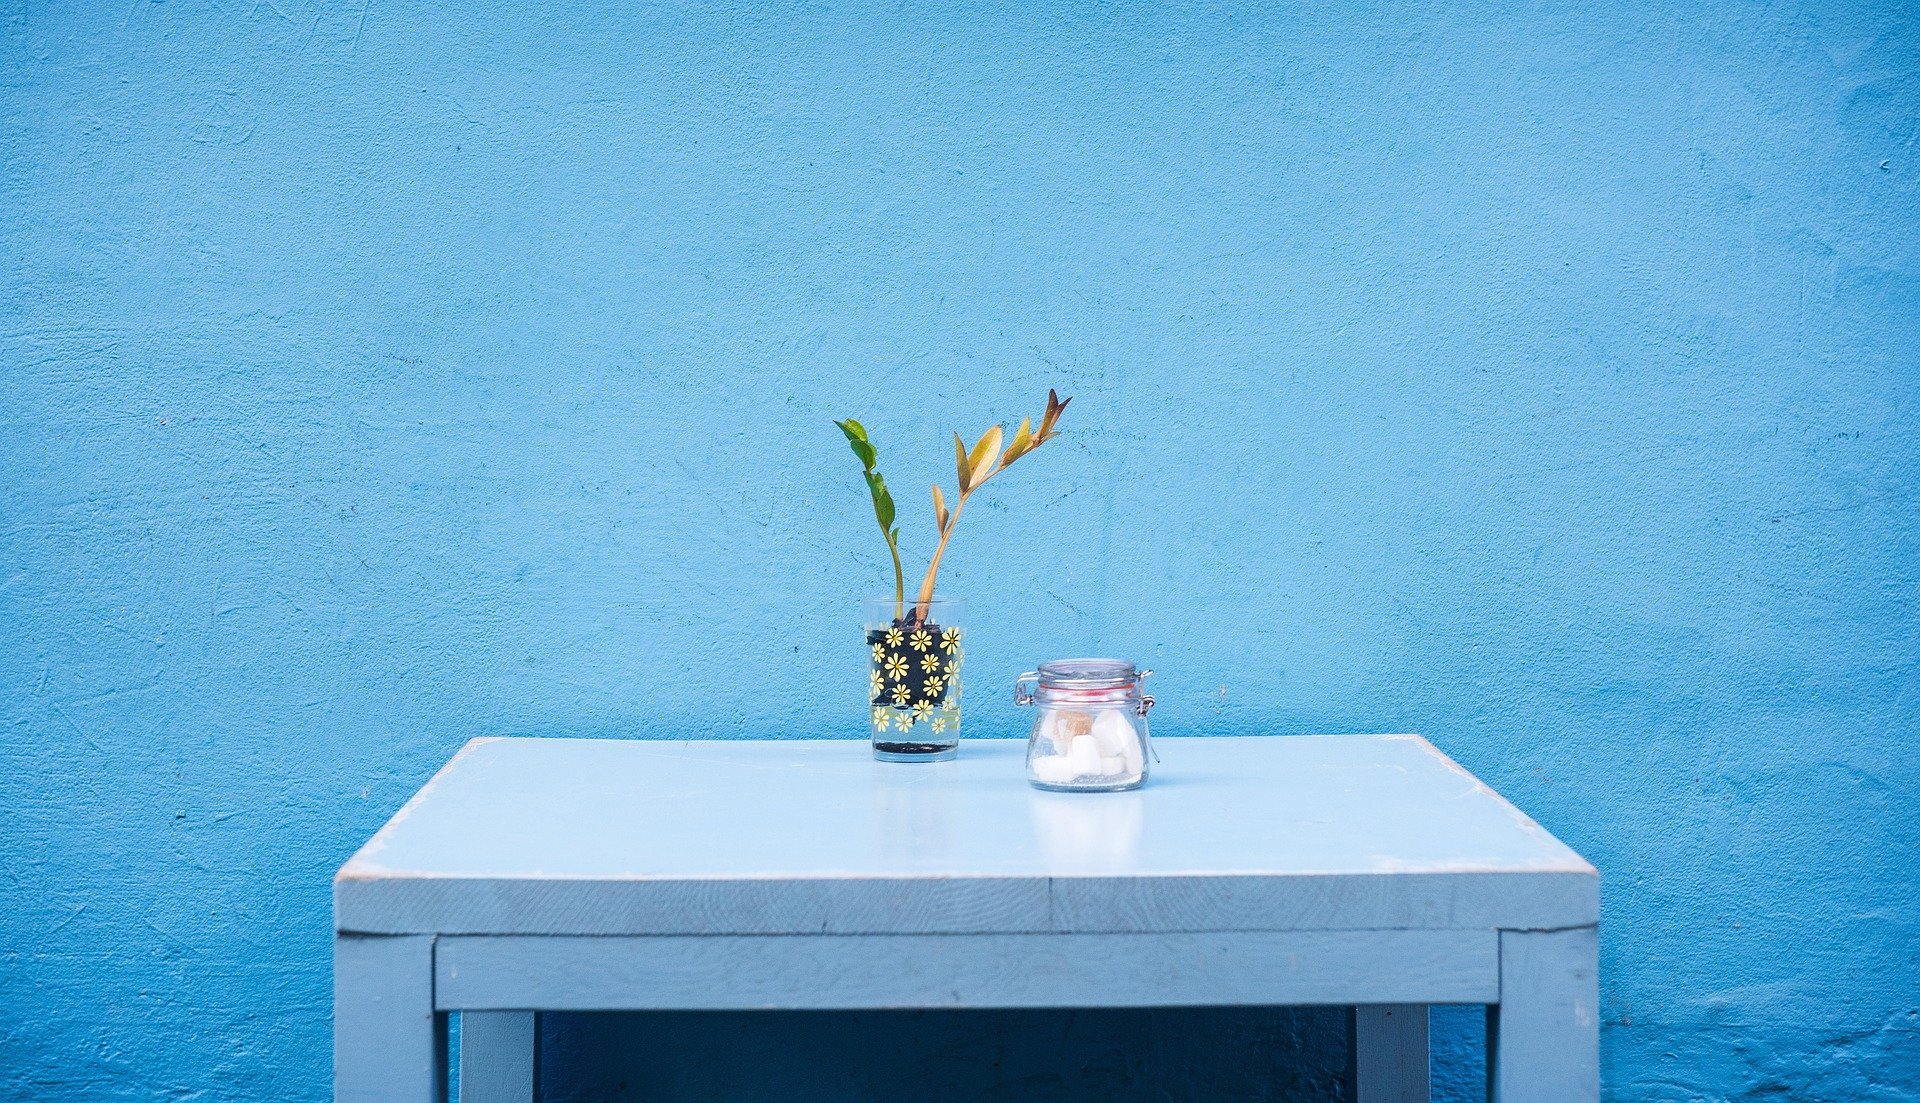 Pared pintada de azul. Fuente: Pixabay